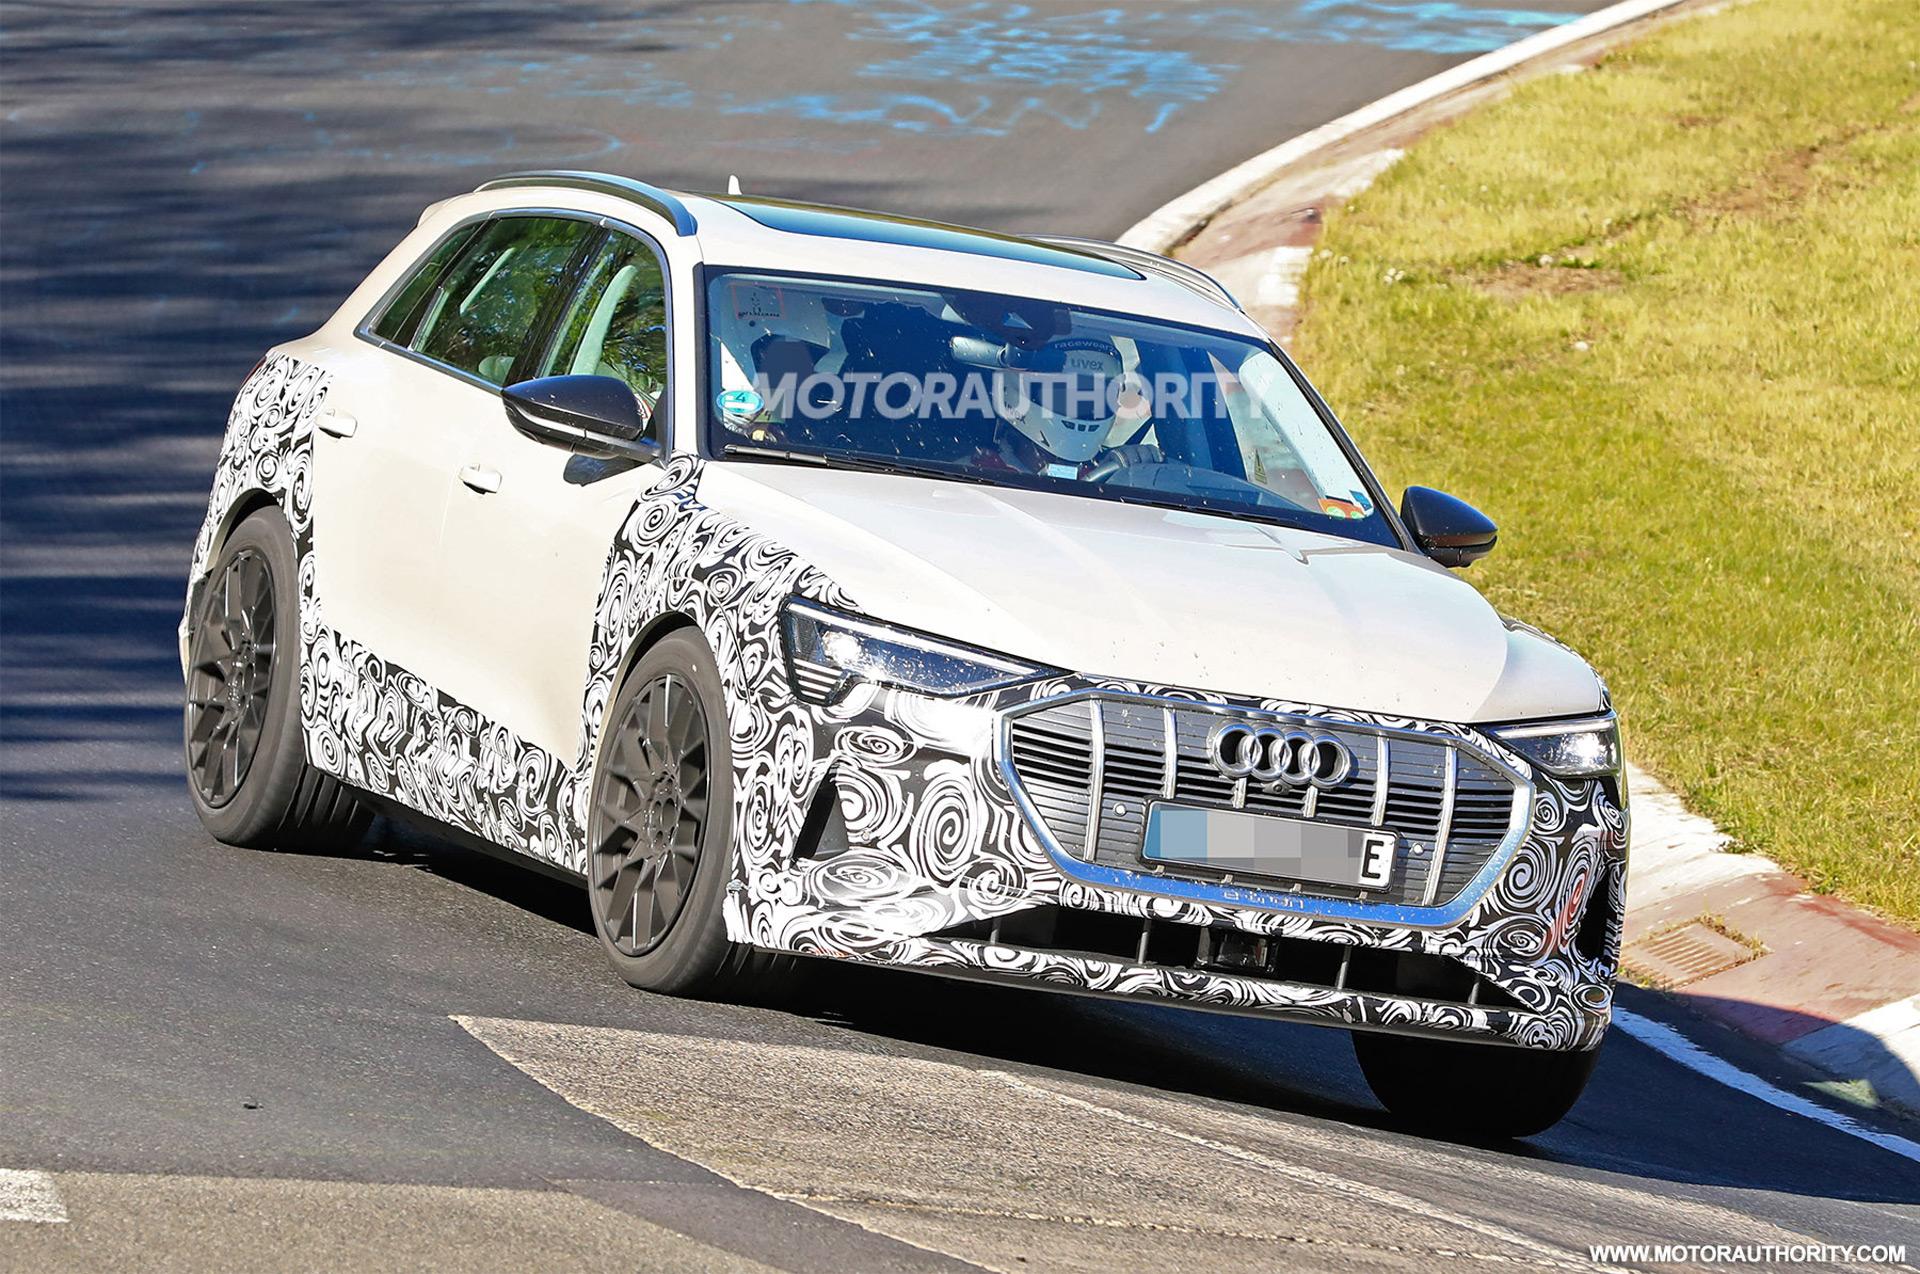 2018 [Audi] E-Tron Quattro - Page 7 2020-audi-e-tron-s-spy-shots--image-via-s-baldauf-sb-medien_100702355_h